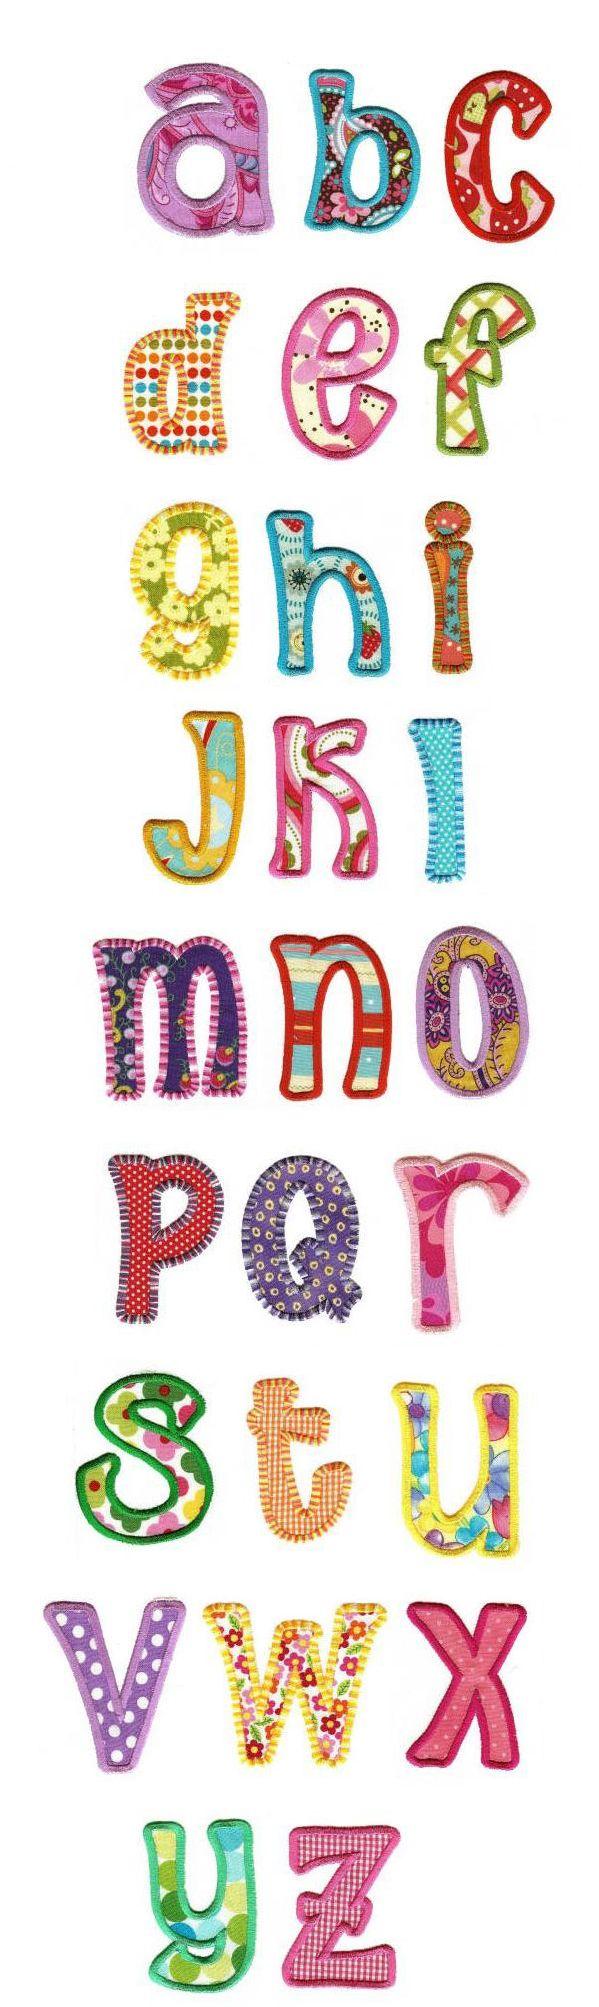 Sunshine Applique Alphabet design set is available for instant download atdesignsbyjuju.com